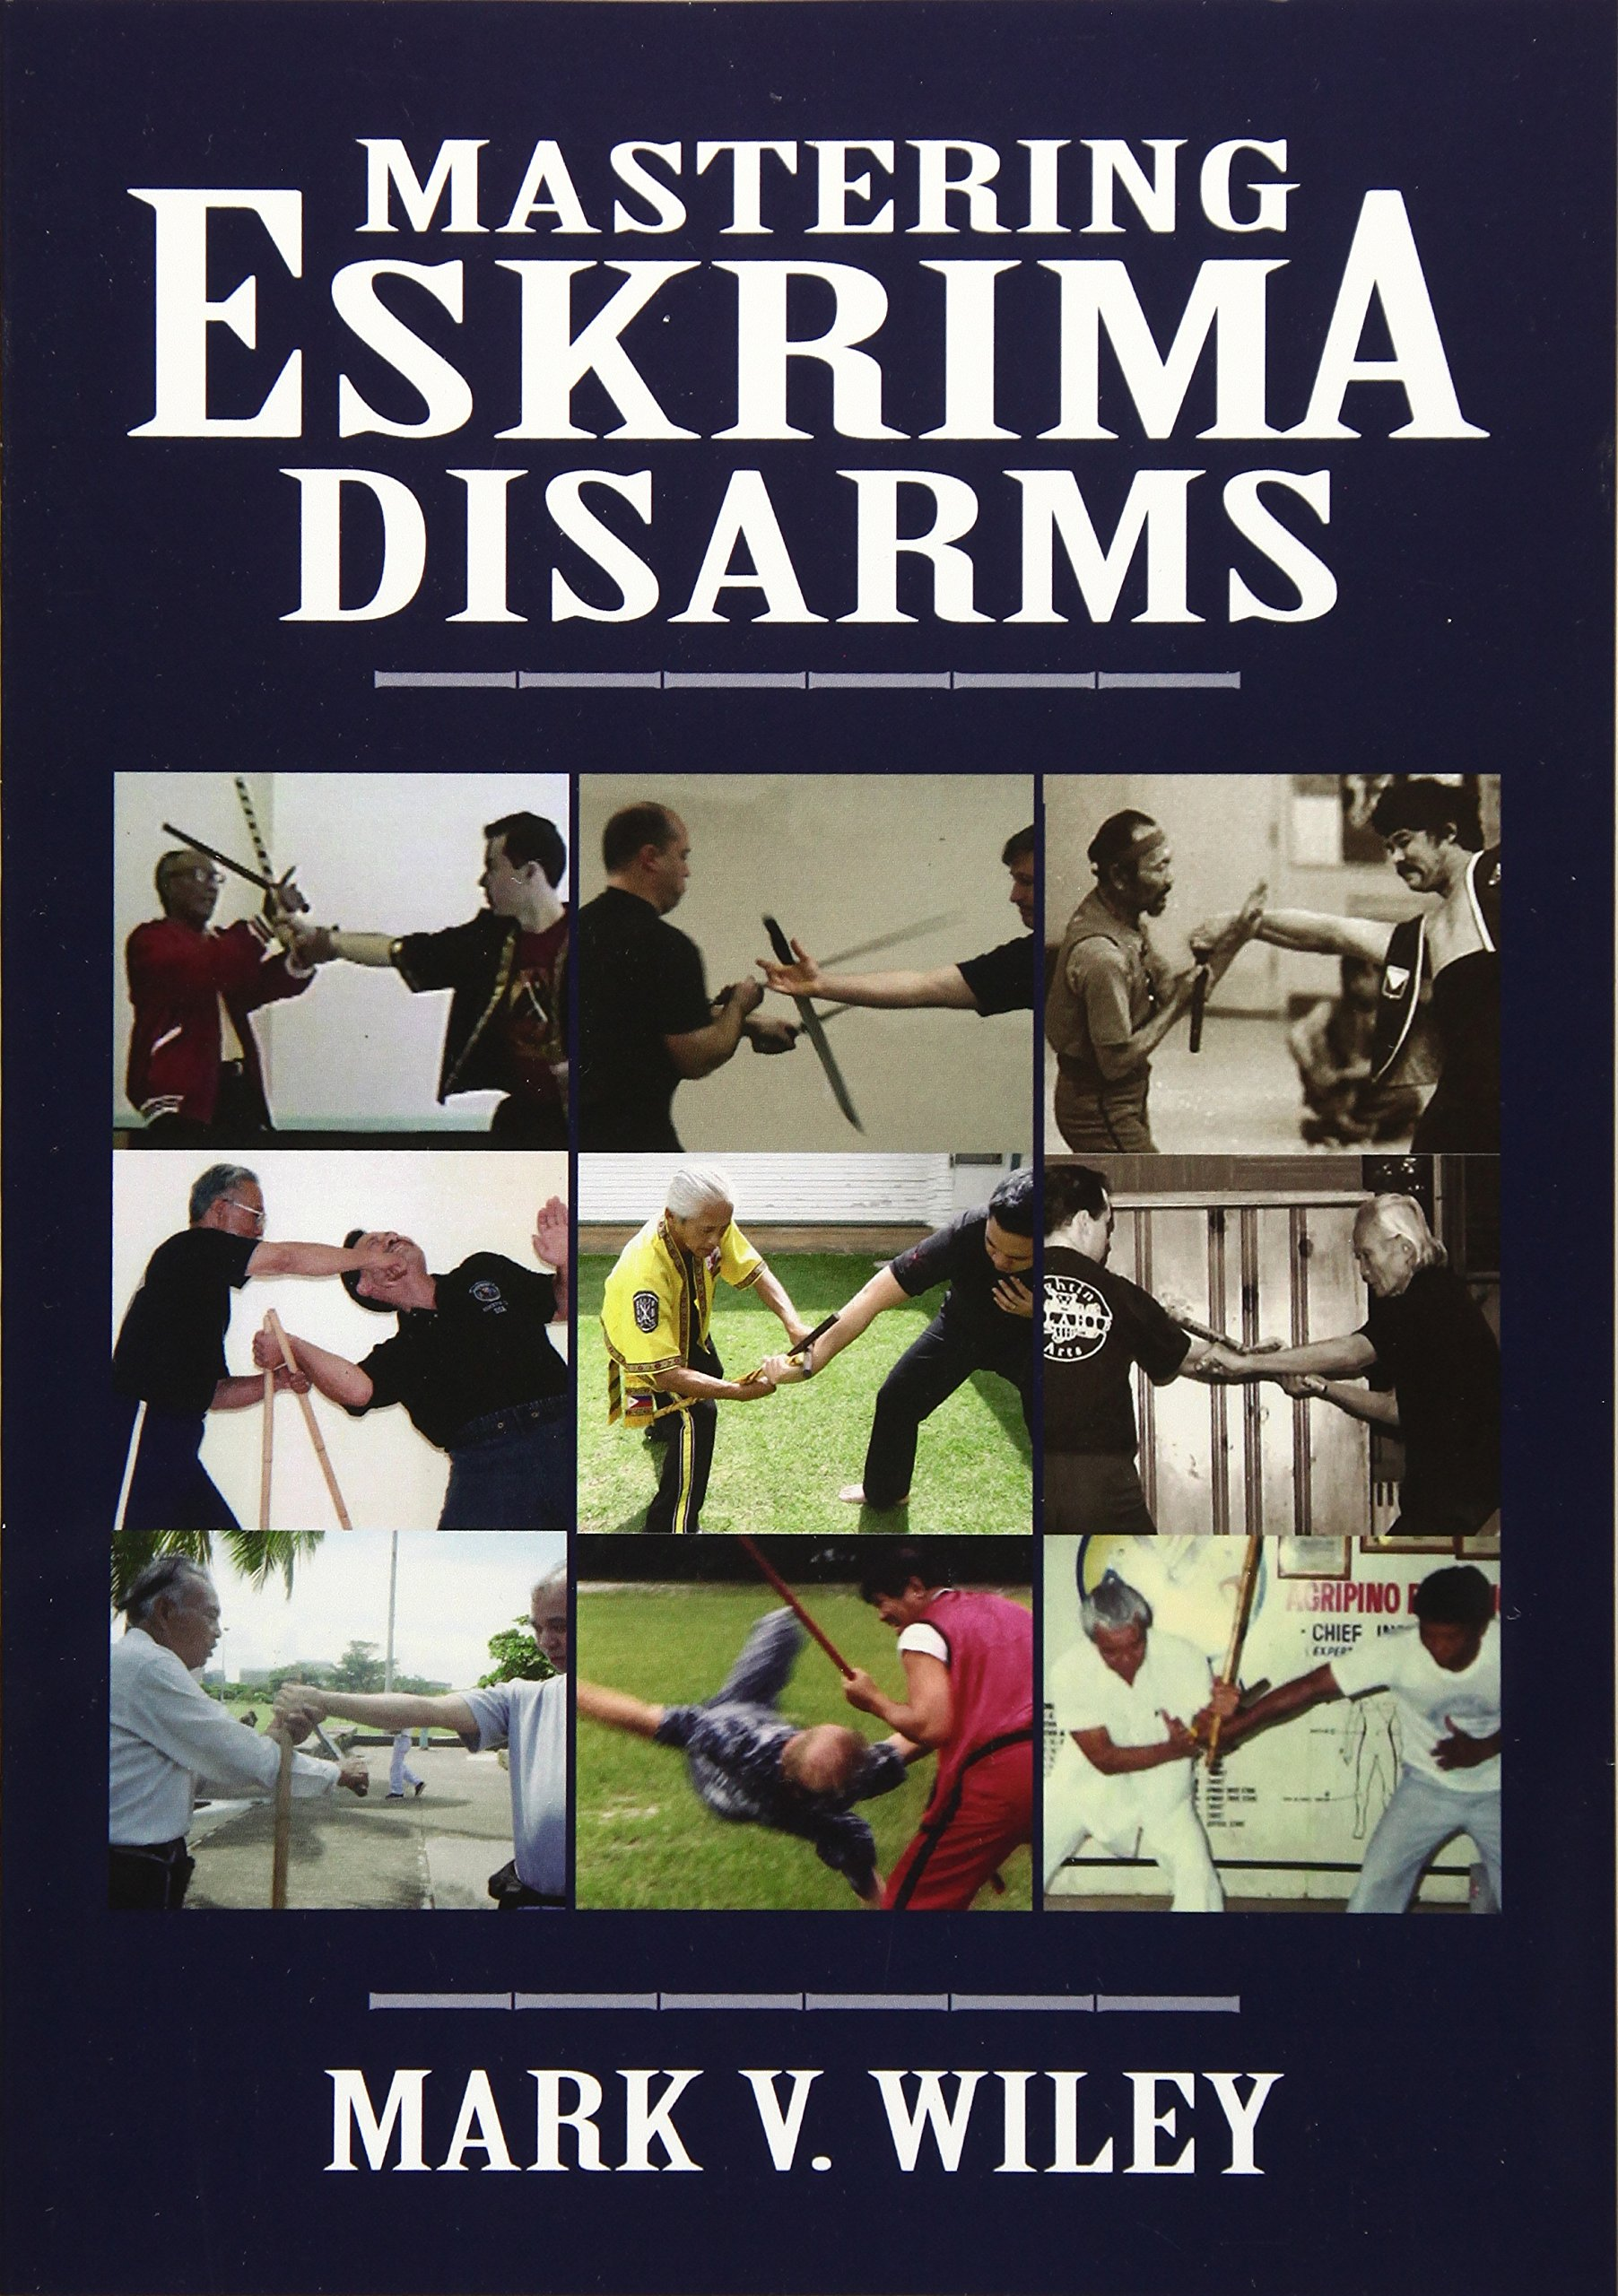 Mastering Eskrima Disarms: Mark V Wiley: 9781943155002: Amazon.com ...